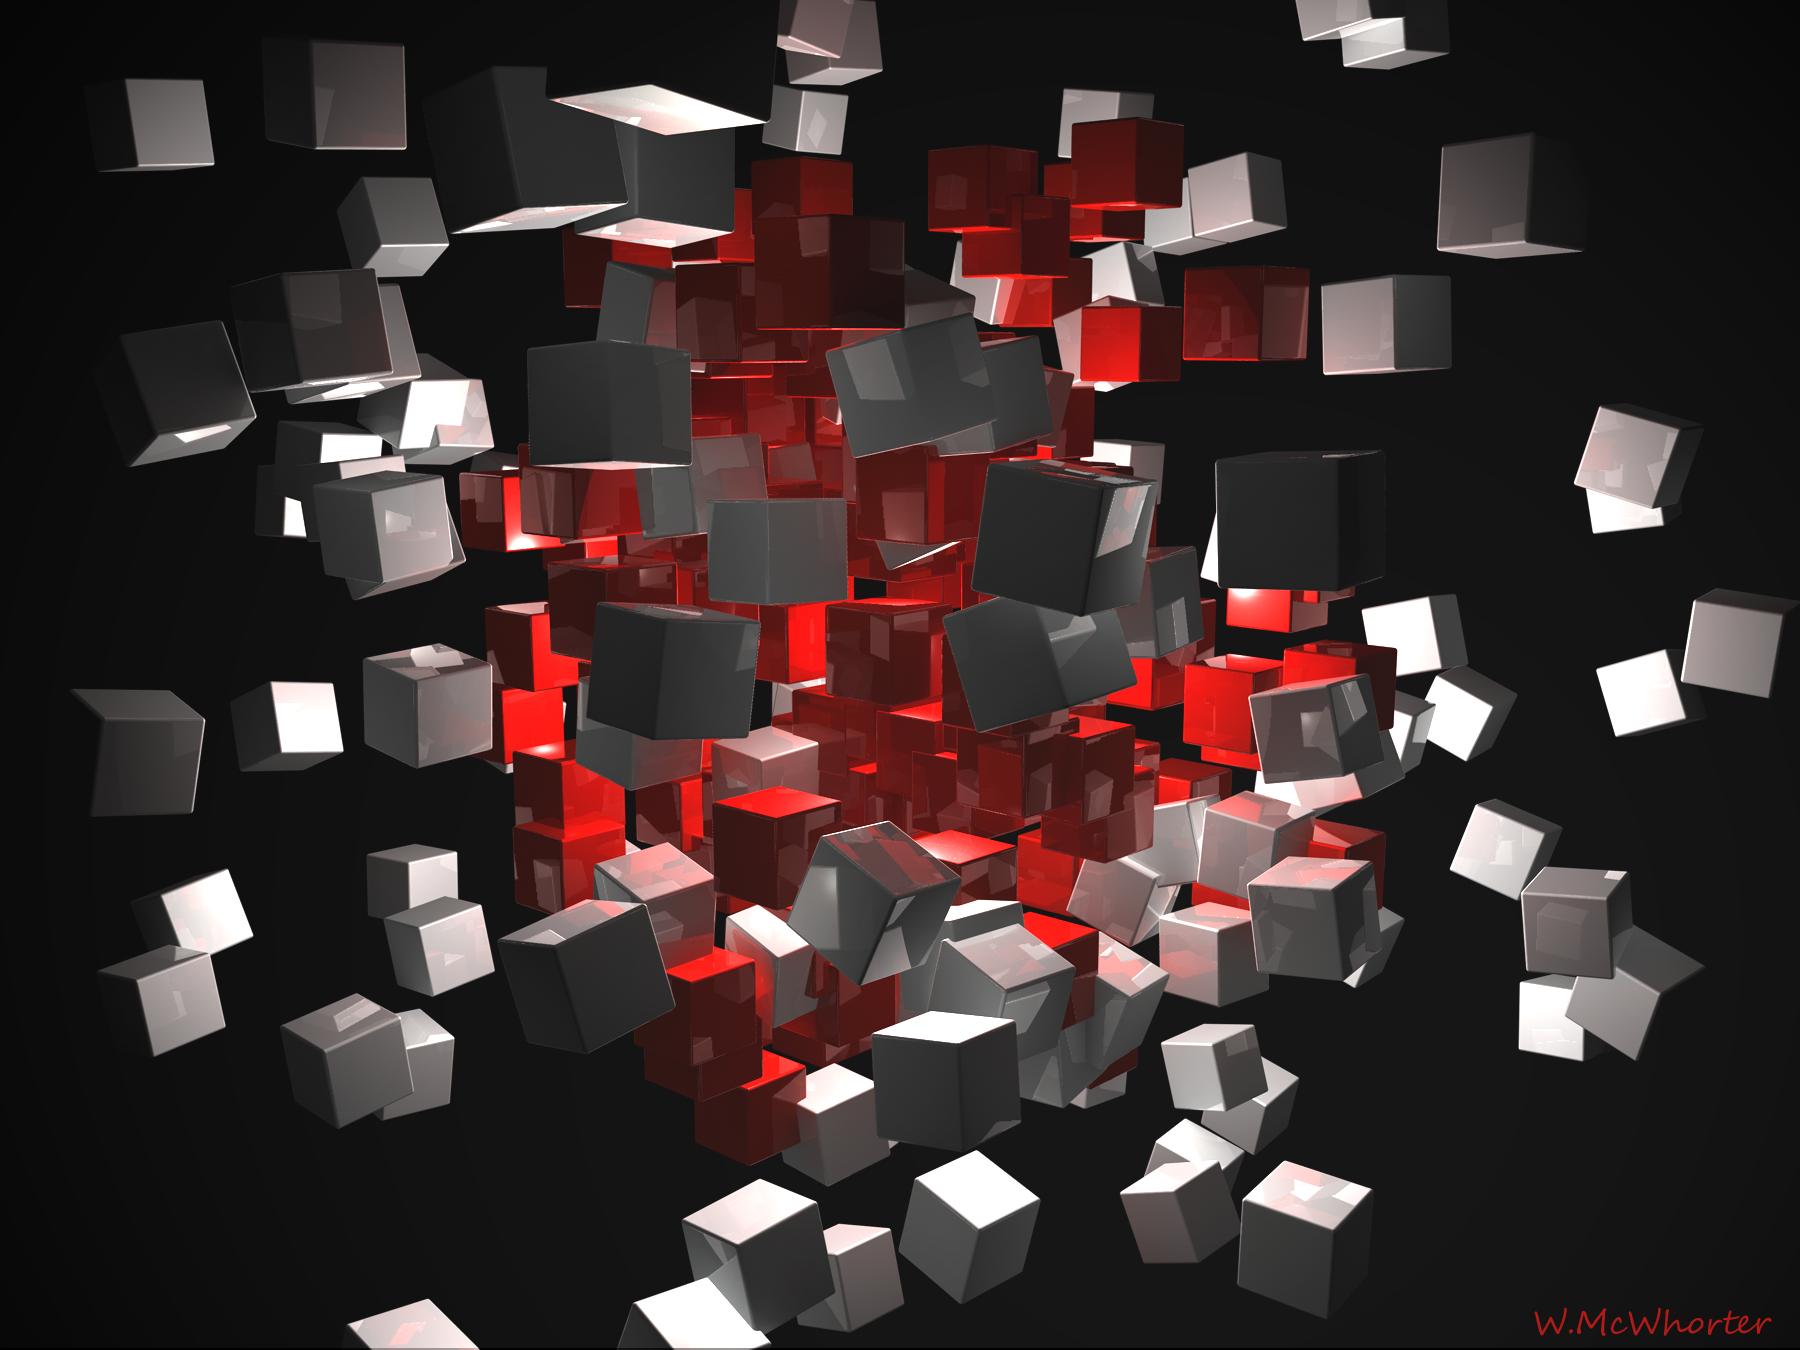 Cubes_RedGrey